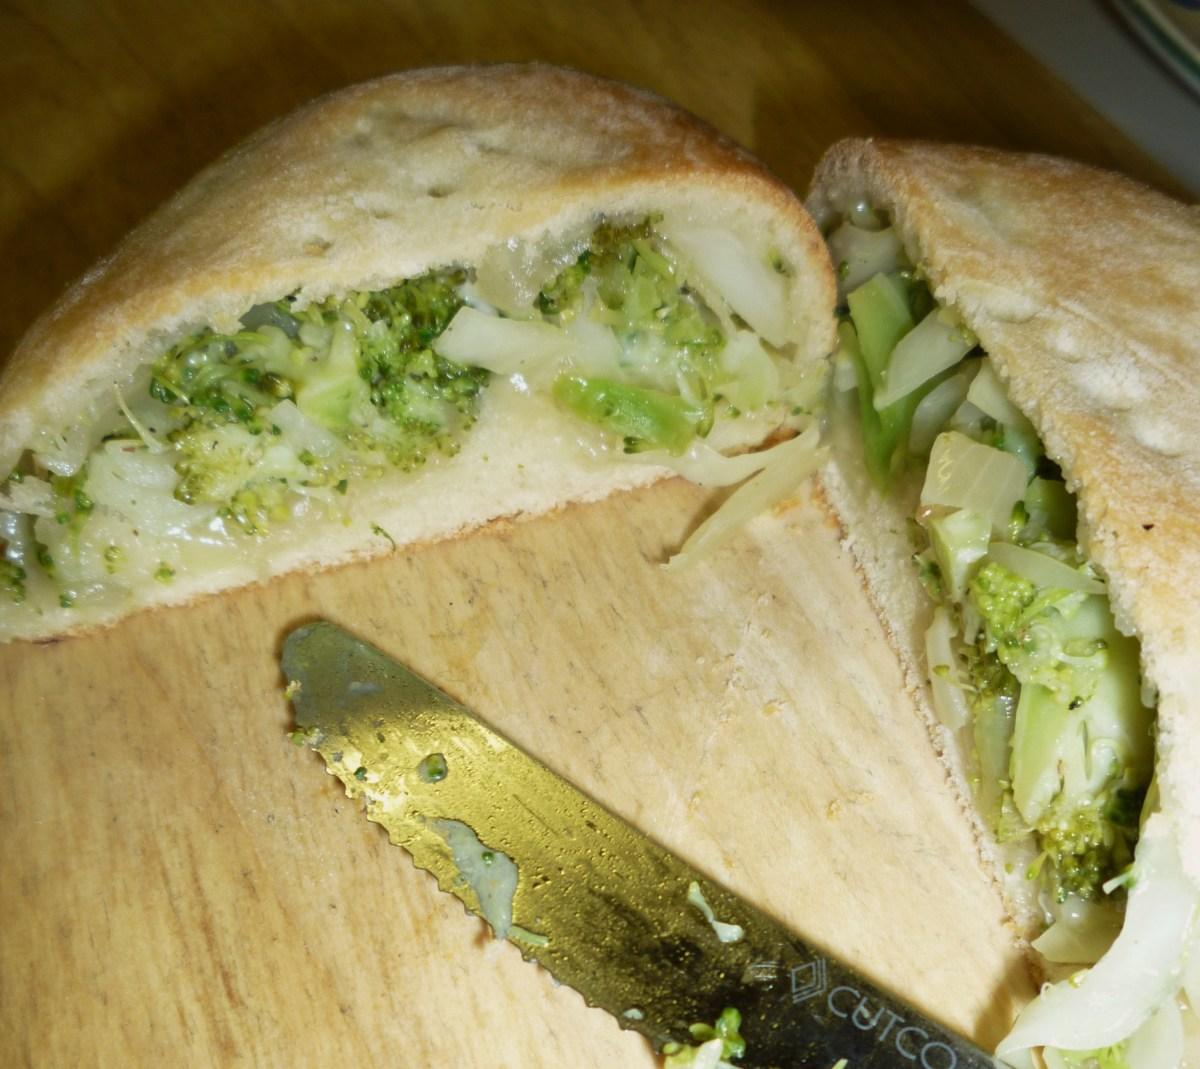 veggie-buns-a-spin-on-the-classic-bierocks-recipe